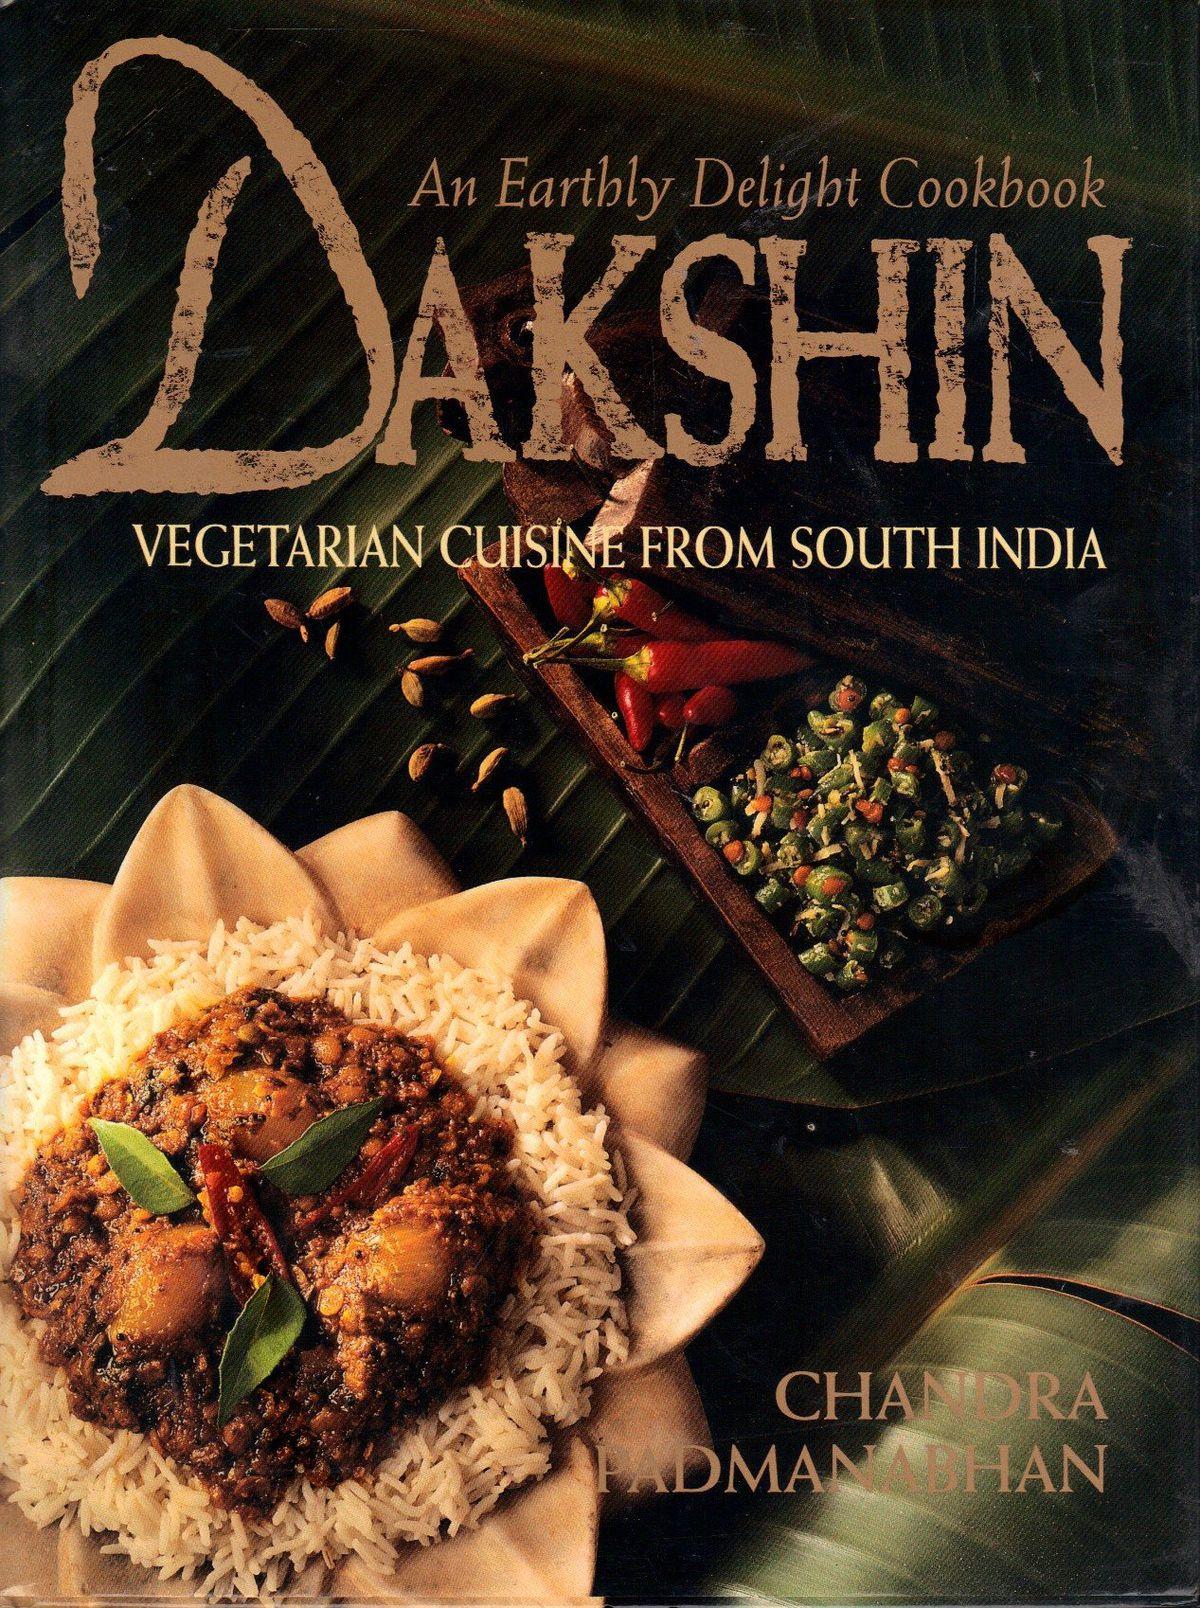 Dakshin by Chandra Padmanabhan, one of the best cookbooks chosen by Eater writers